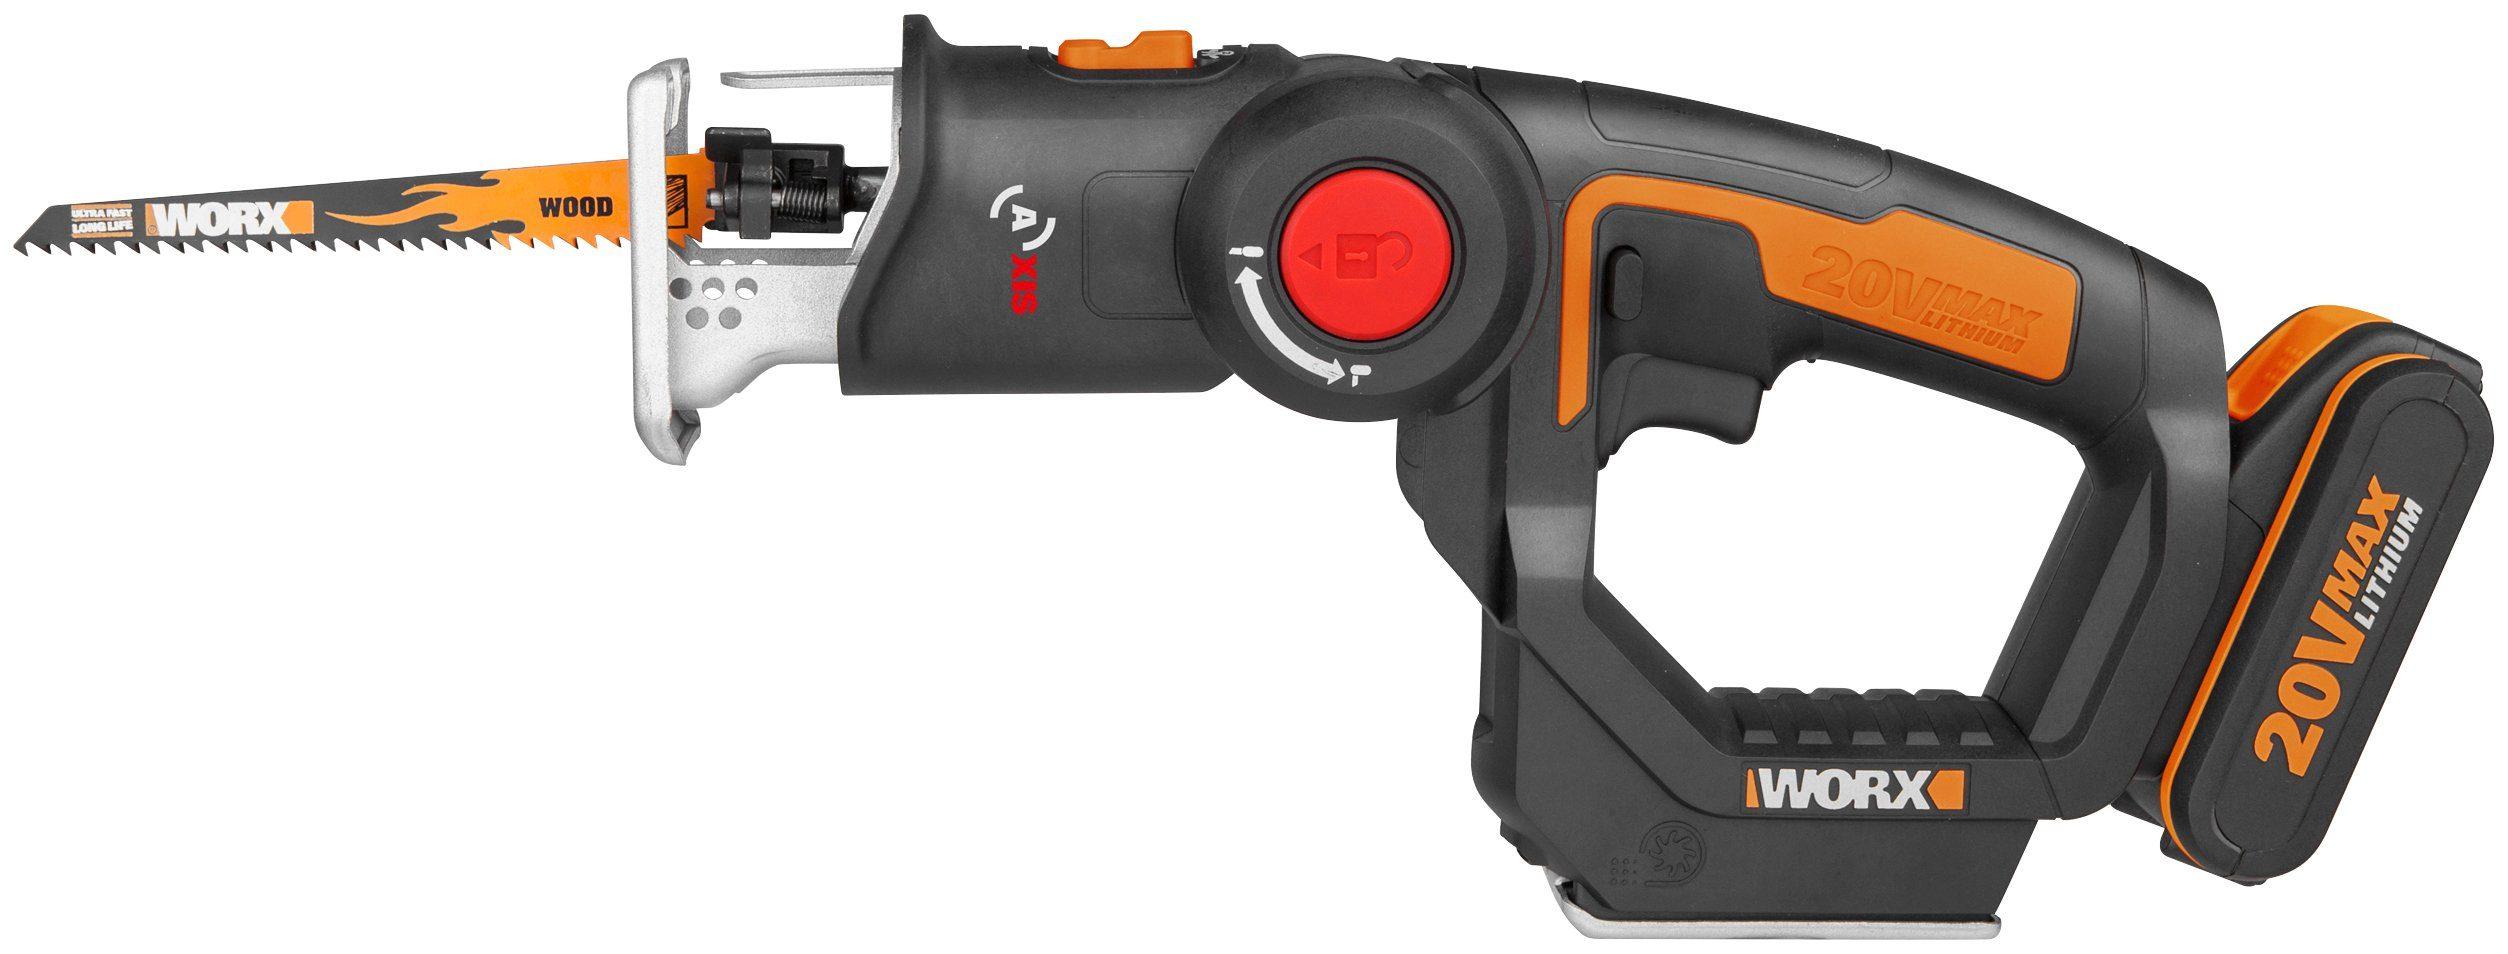 WORX Akku-Multisäge »WX550 Trans4mer«